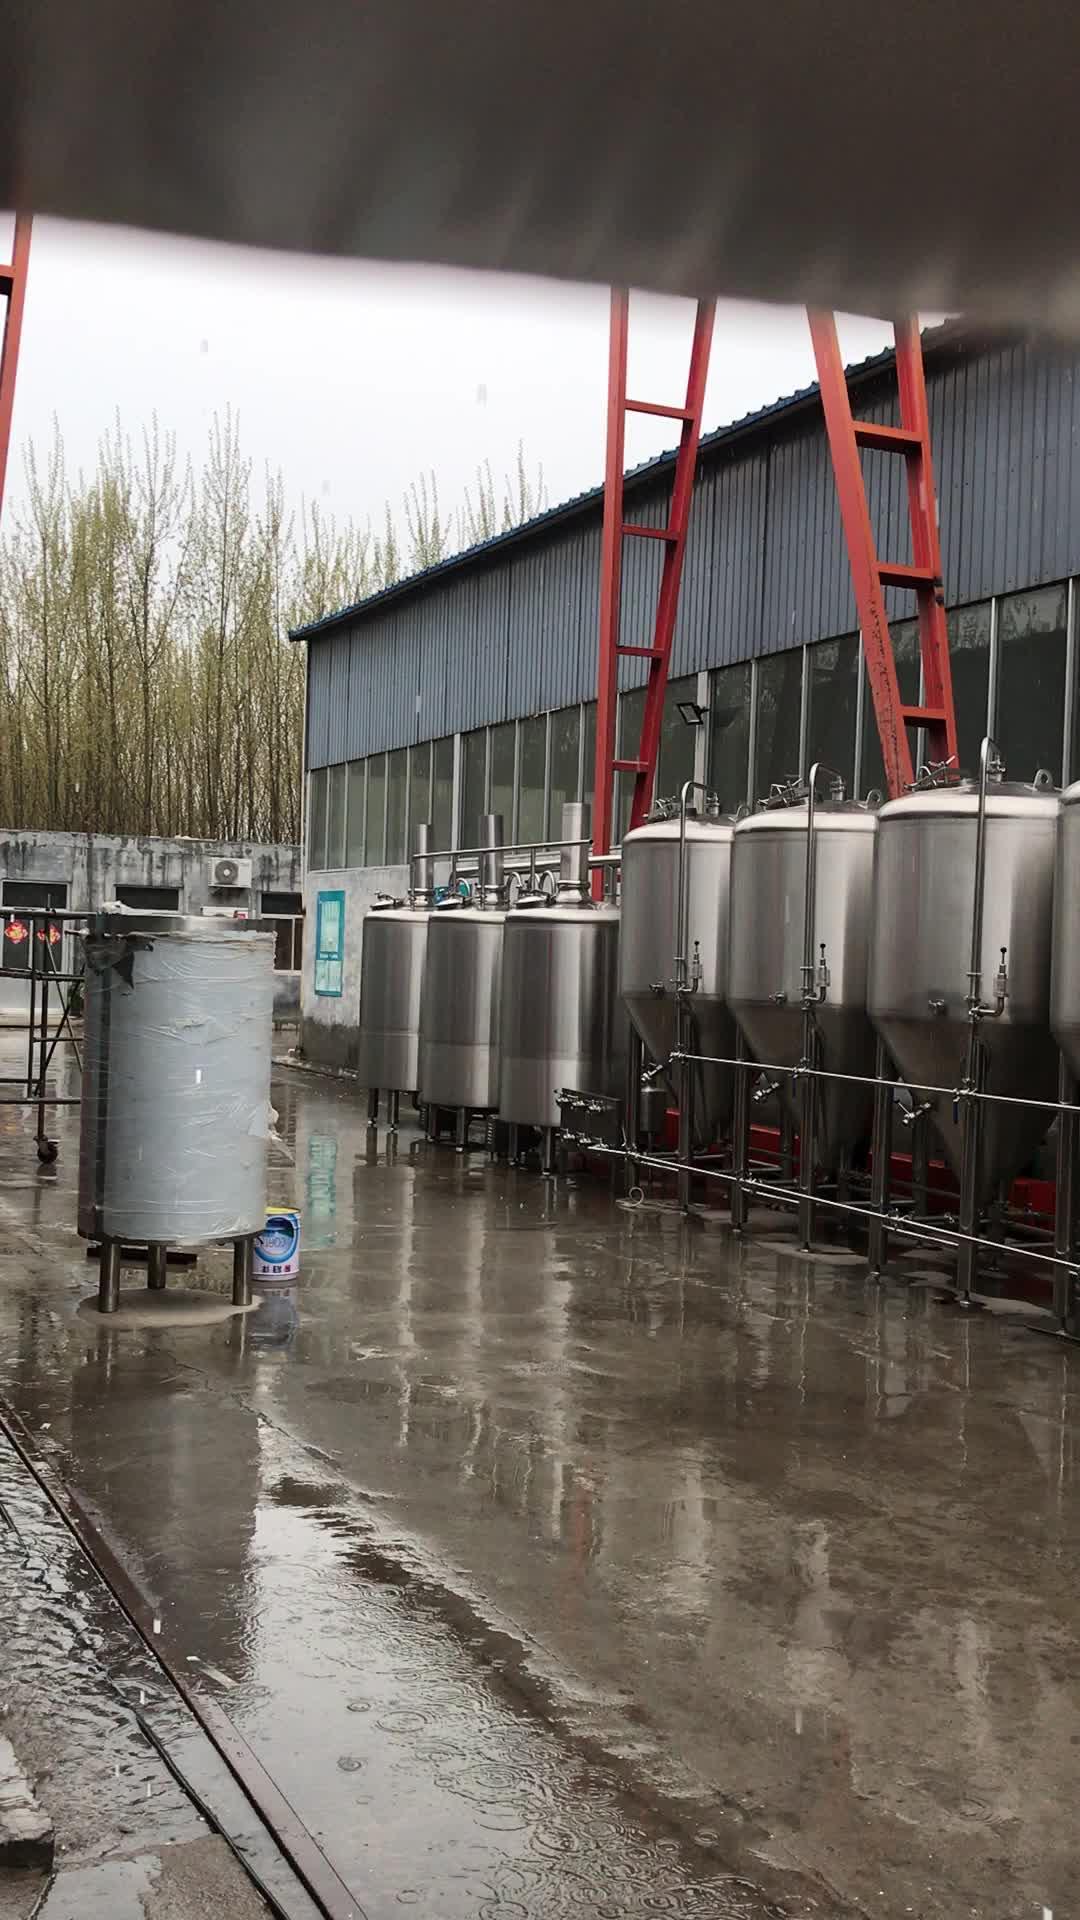 Hot sale double-wall  brite beer tank, beer serving tank, beer storage tank CE/ISO 9001:2008